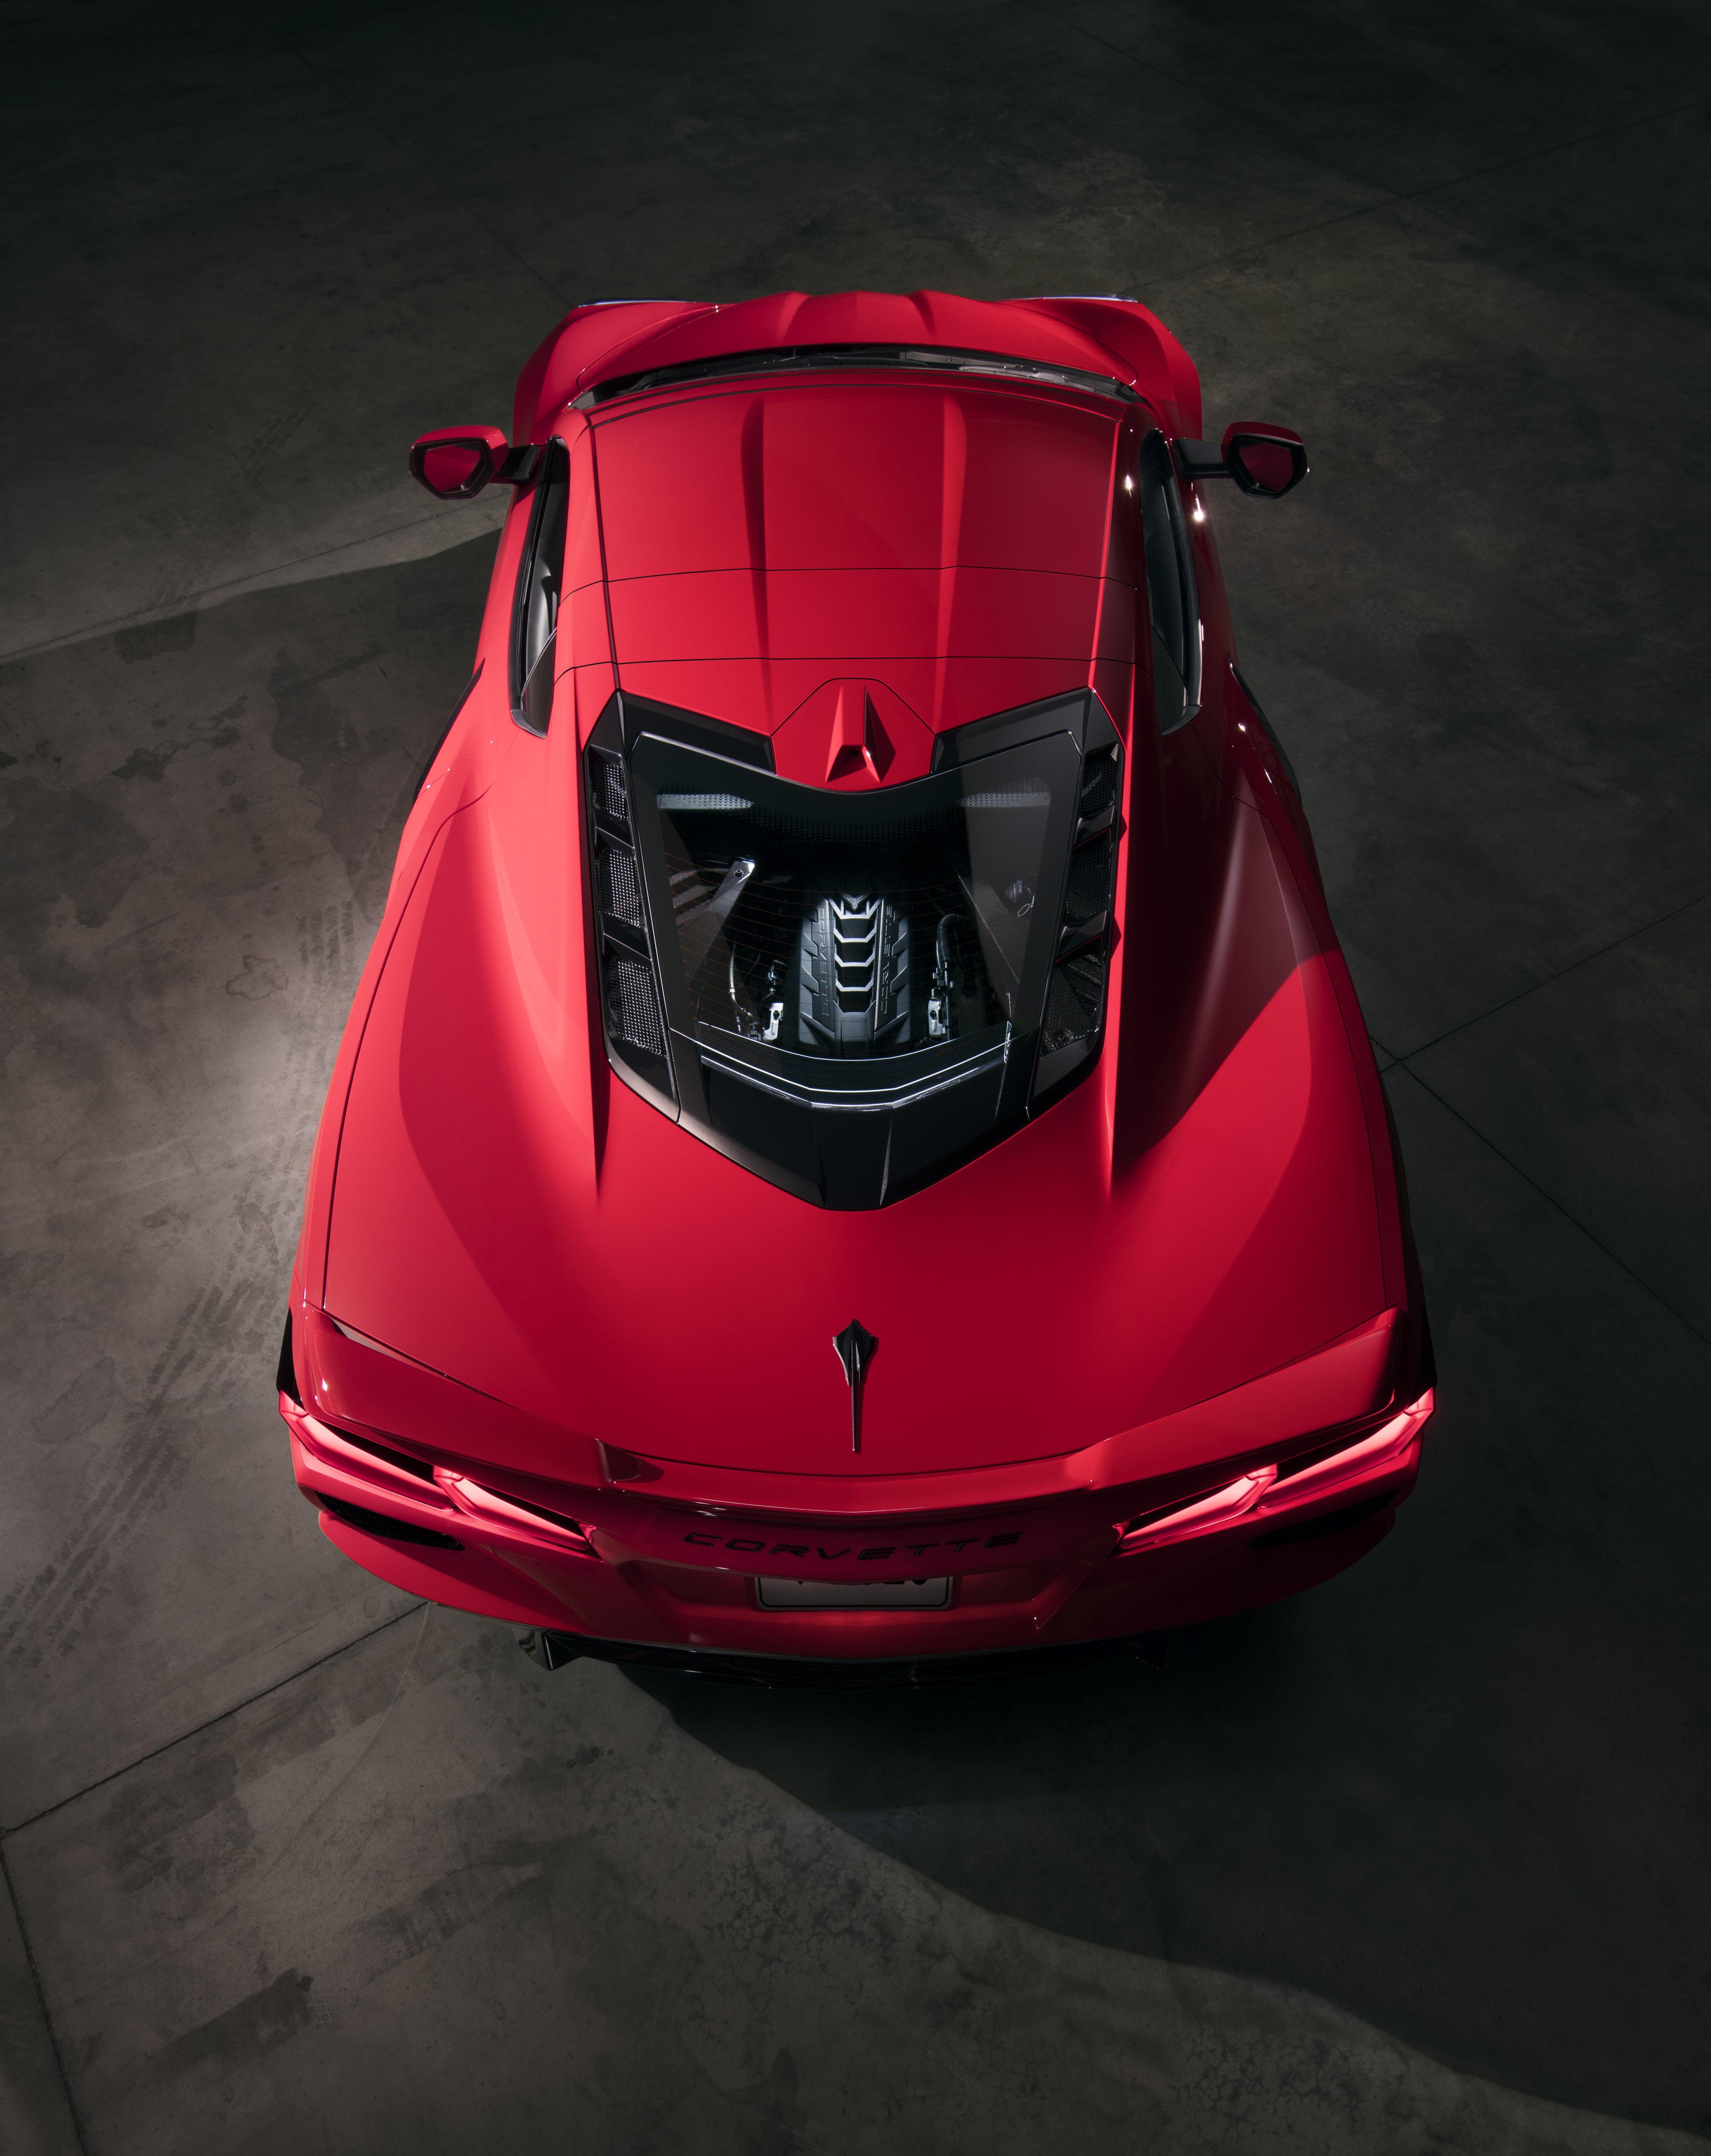 Holden To Welcome New Corvette To Australia